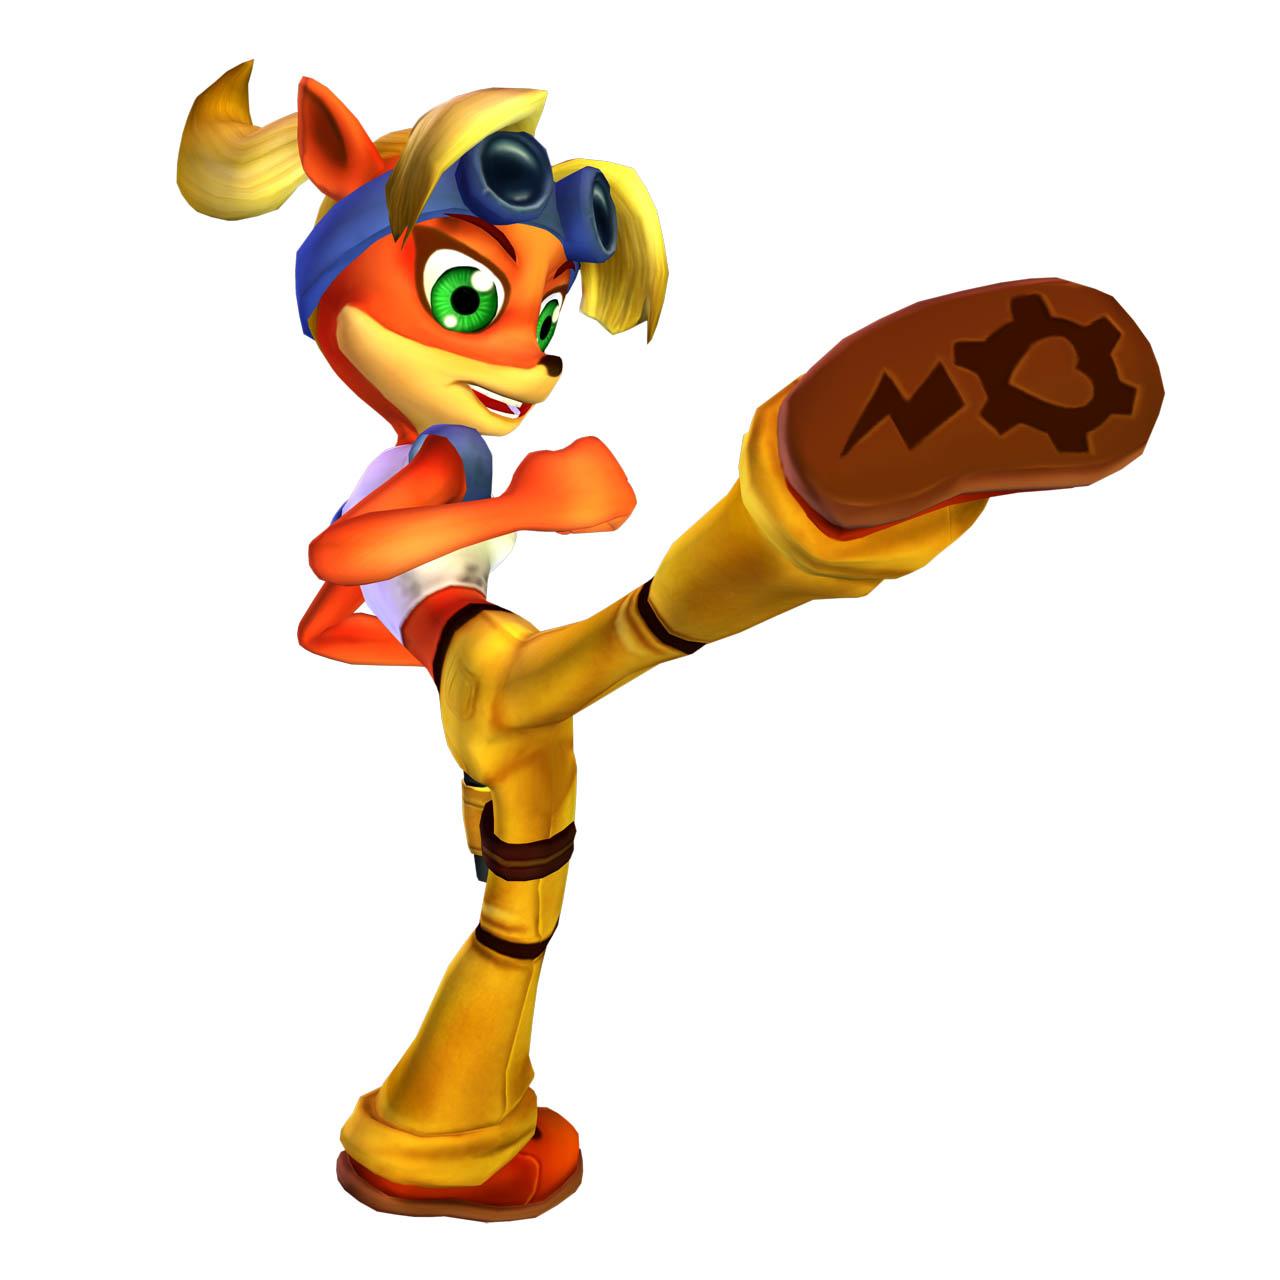 coco bandicoot pooh s adventures wiki fandom powered treasure clipart png treasure clipart